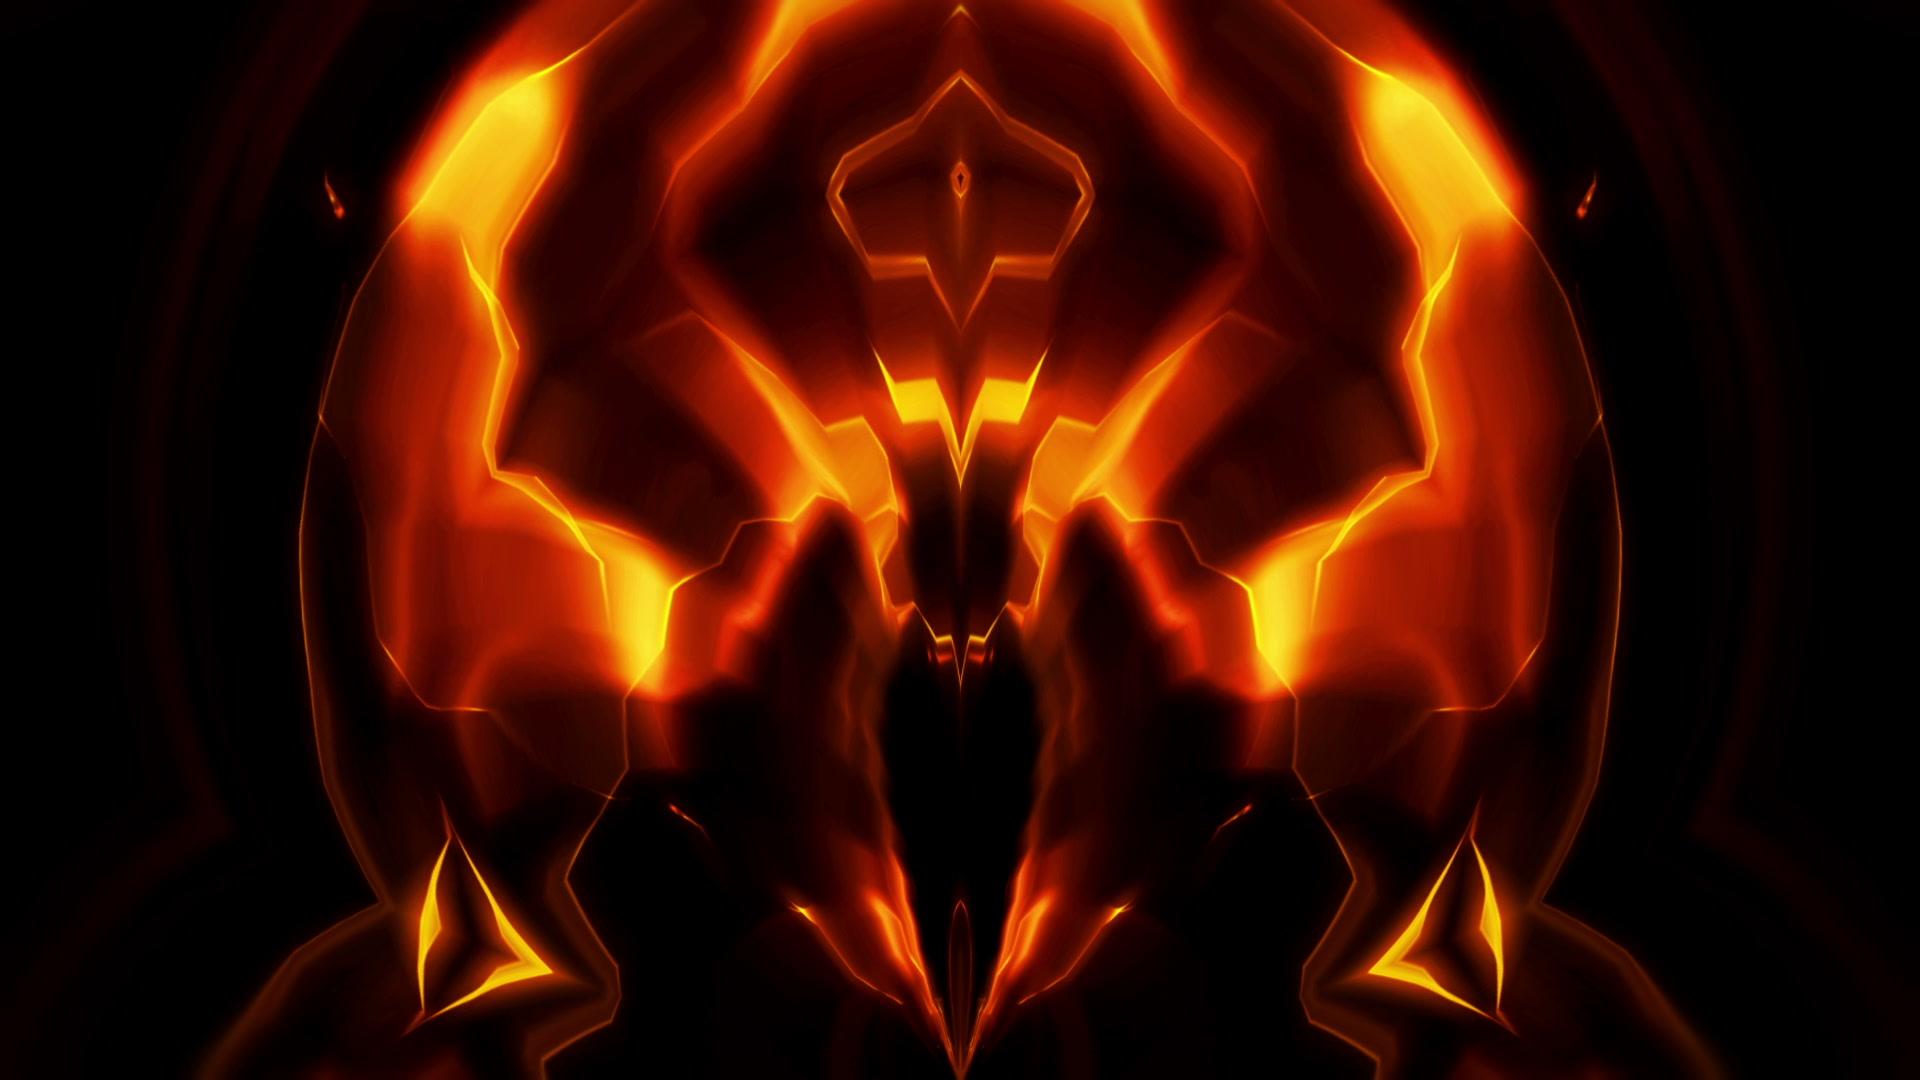 vj video background Warm-Energy-Fullhd-LIMEART-VJ-Loop_003